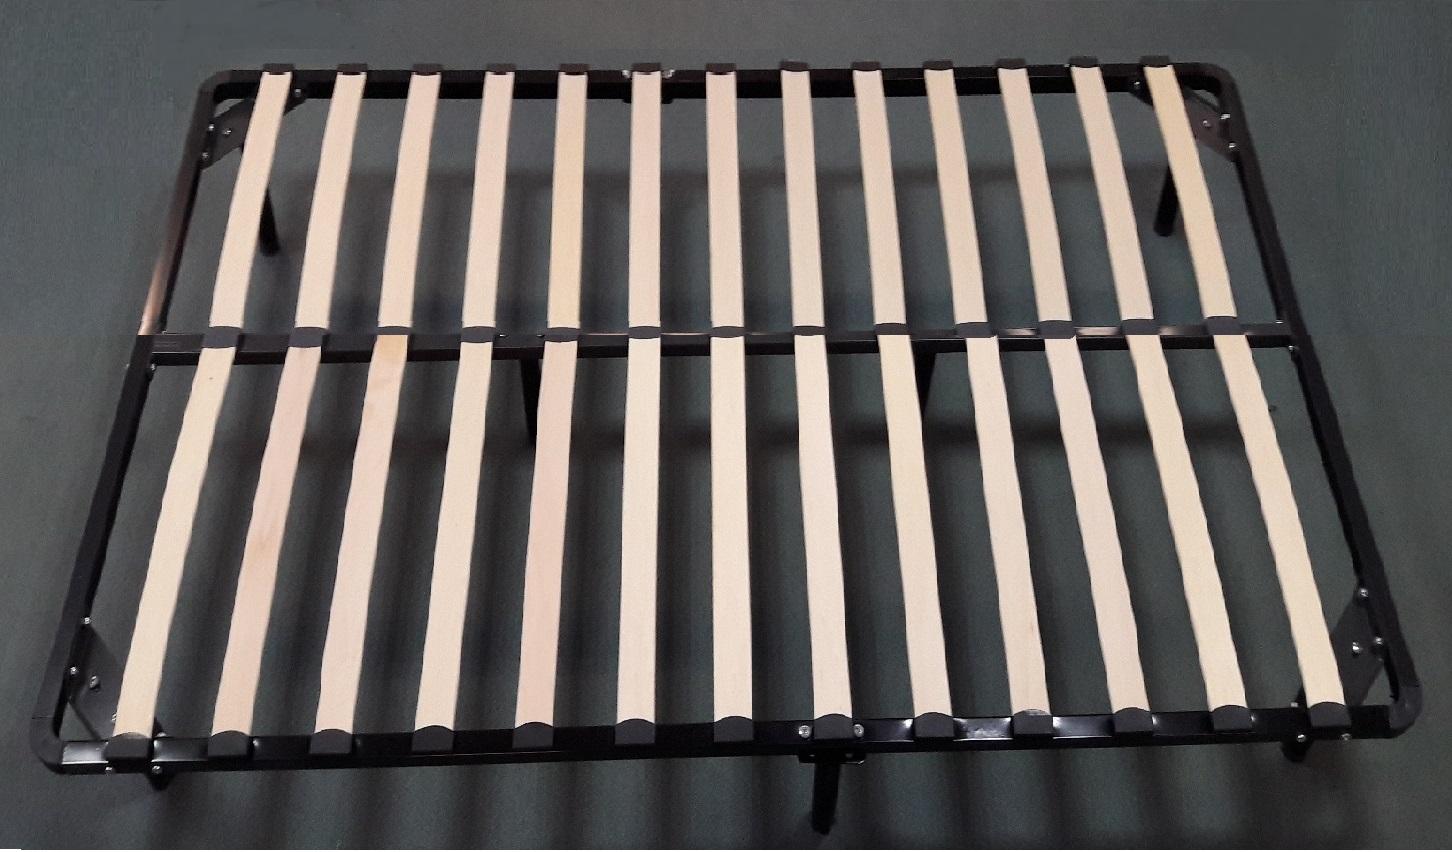 lattenrost f r bett 160x200cm inkl f e aus metall lt160. Black Bedroom Furniture Sets. Home Design Ideas